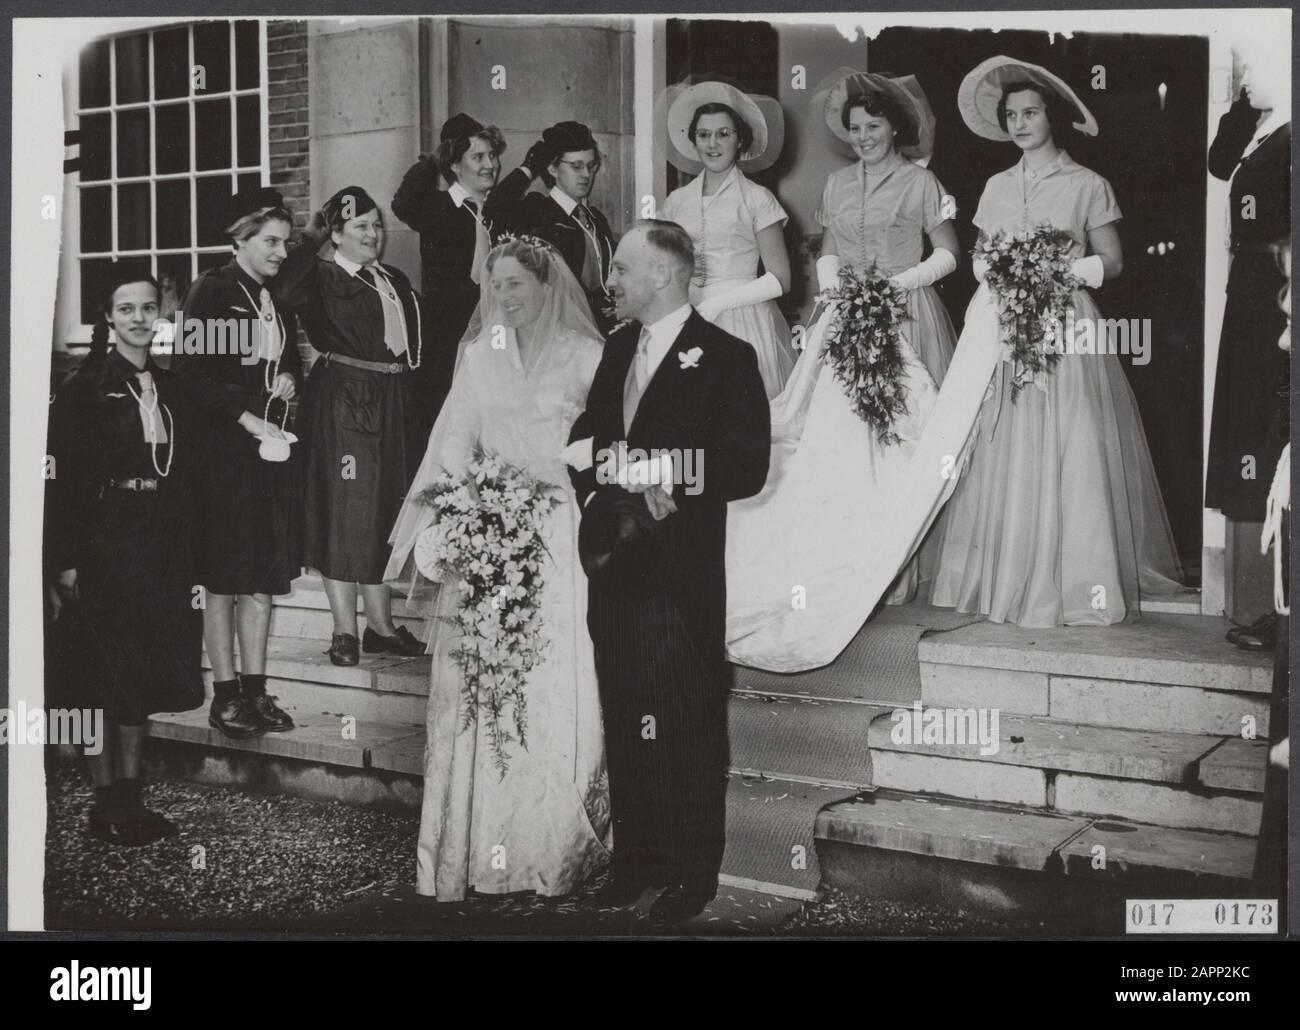 royal house, princesses, marriages, town halls, bridesmaids, Beatrix, princess, Booy T., Randwijk Mrs. S.e.v., Rappard, B.van, Roëll, Renée Date: 30 October 1954 Location: Gorssel Keywords: bridesmaids, weddings, royal house, princesses, town halls Personal name: Beatrix, princess, Booy T., Randwijk Mrs. S.e.v., Rappard, B.van, Roëll, Renée Stock Photo